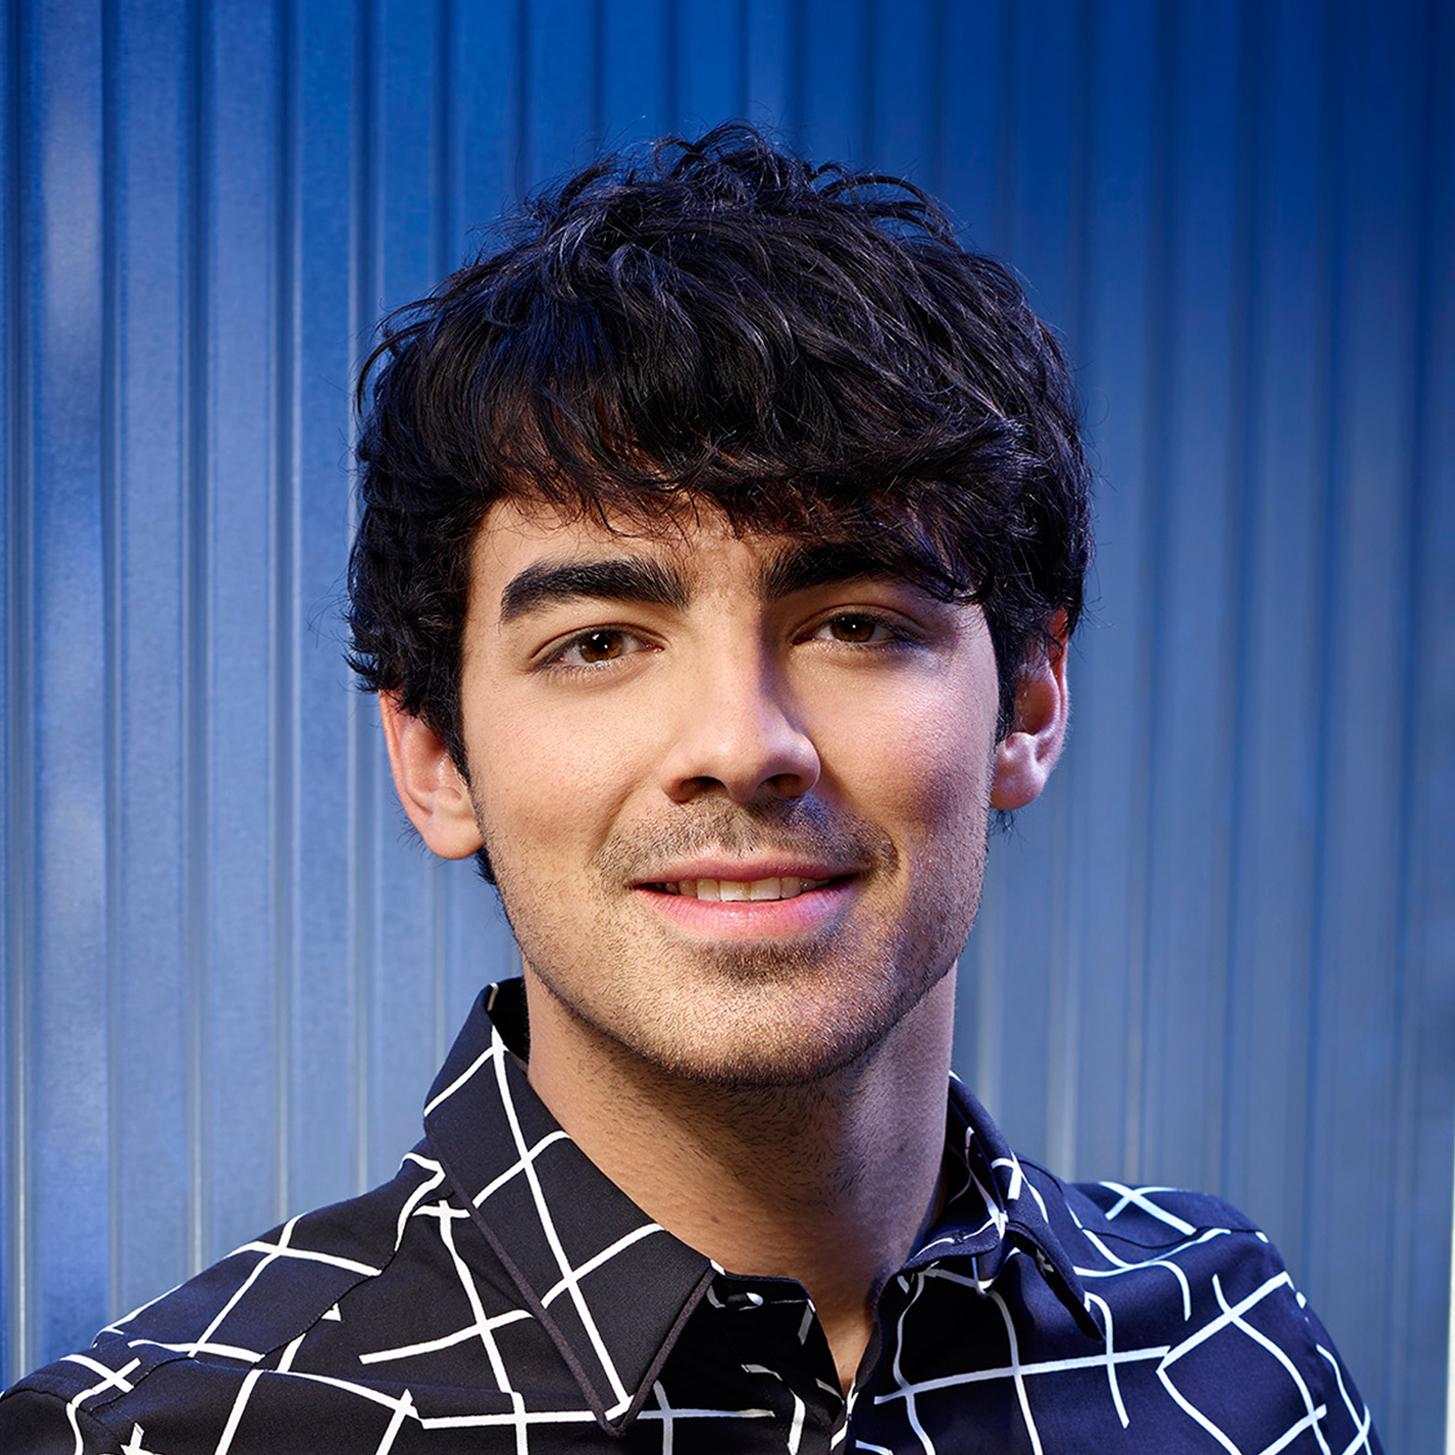 Singer Joe Jonas - age: 31